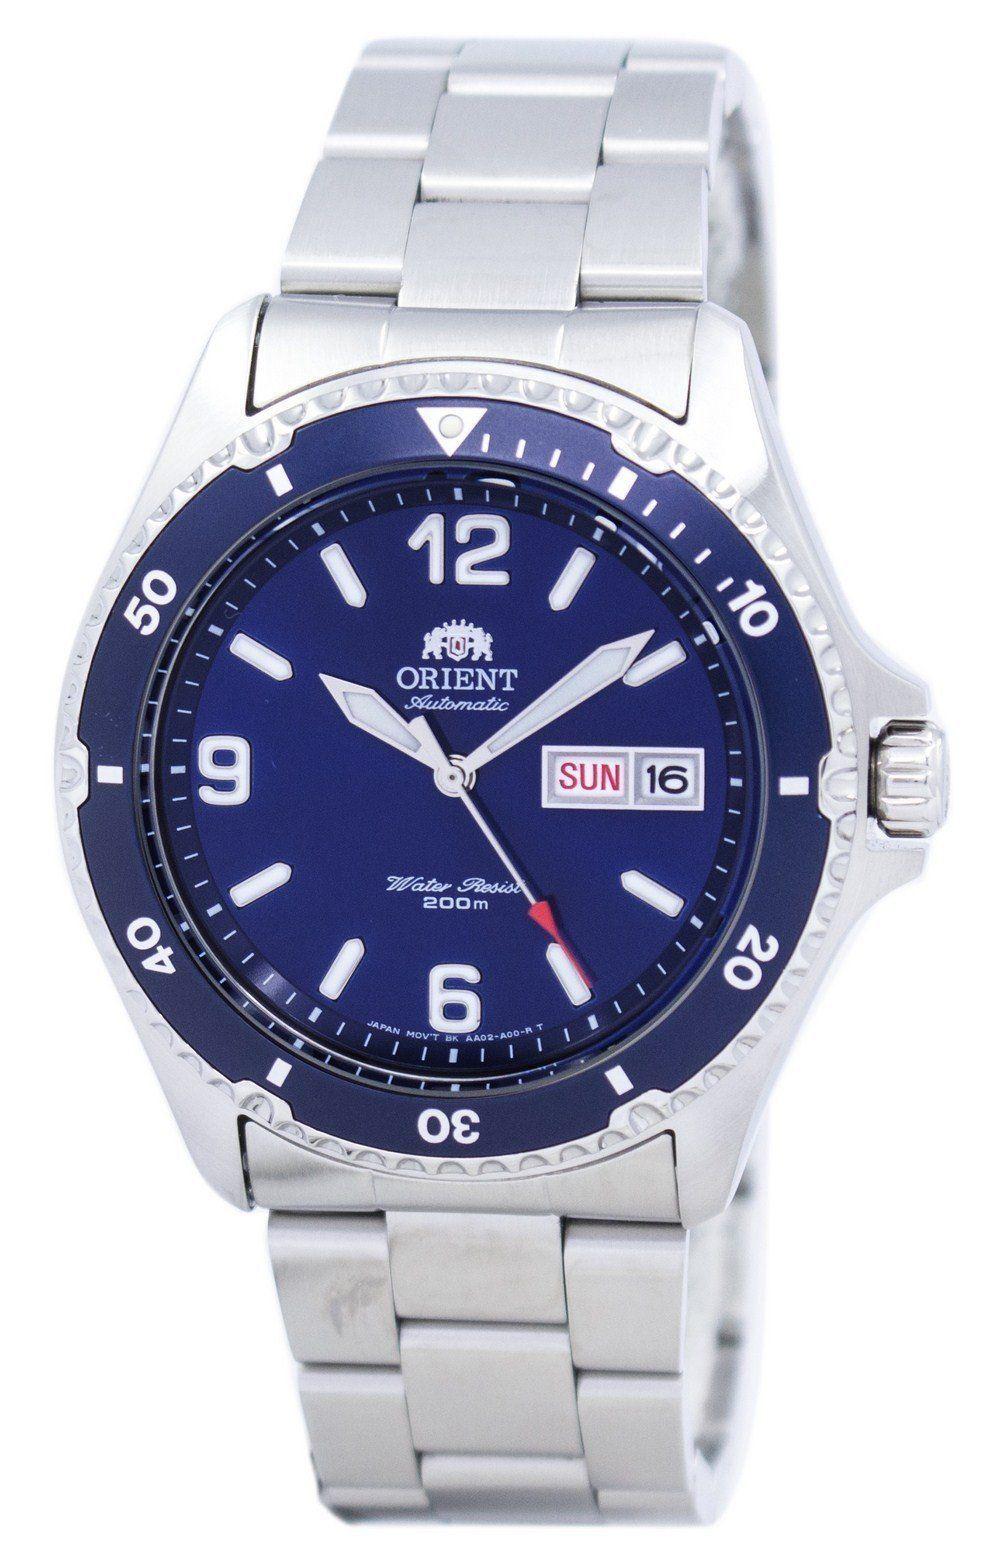 Reloj de hombre Orient Mako II Automatic 200M FAA02002D9